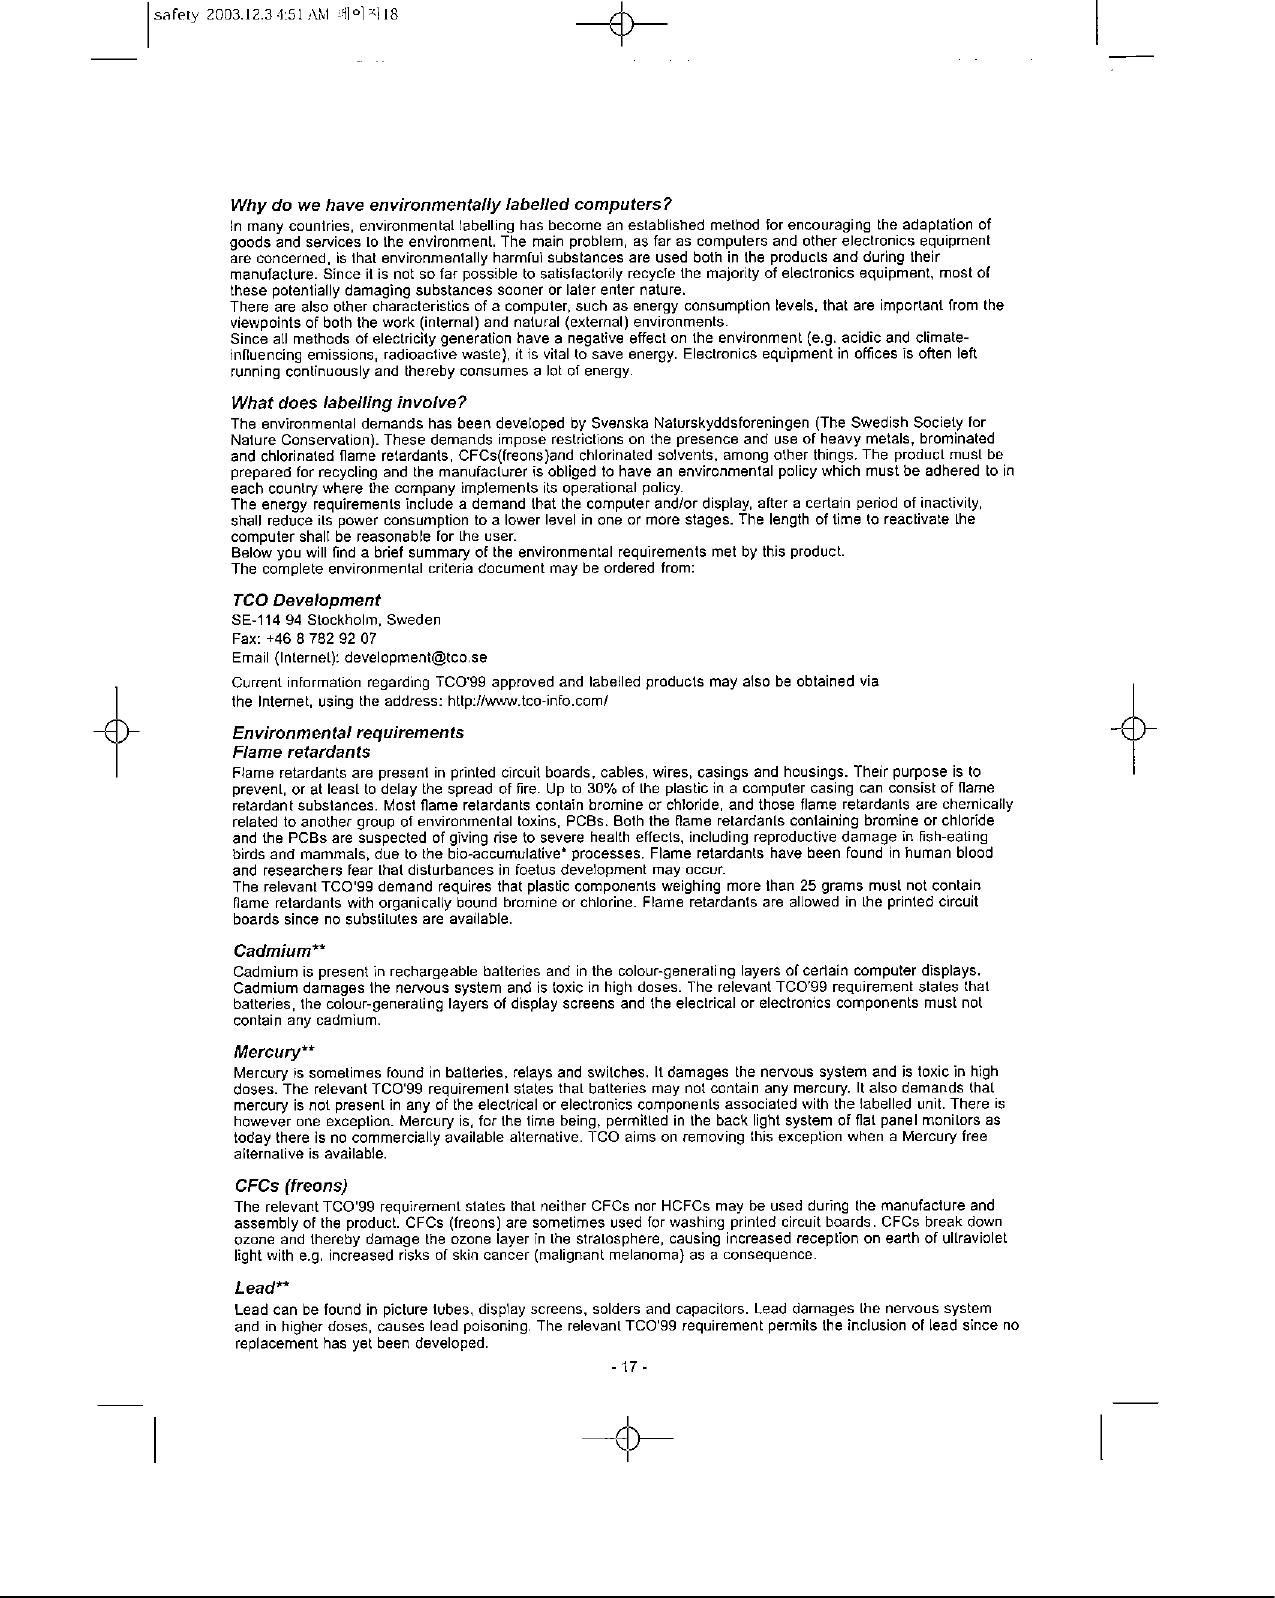 samsung lcd tv user manual